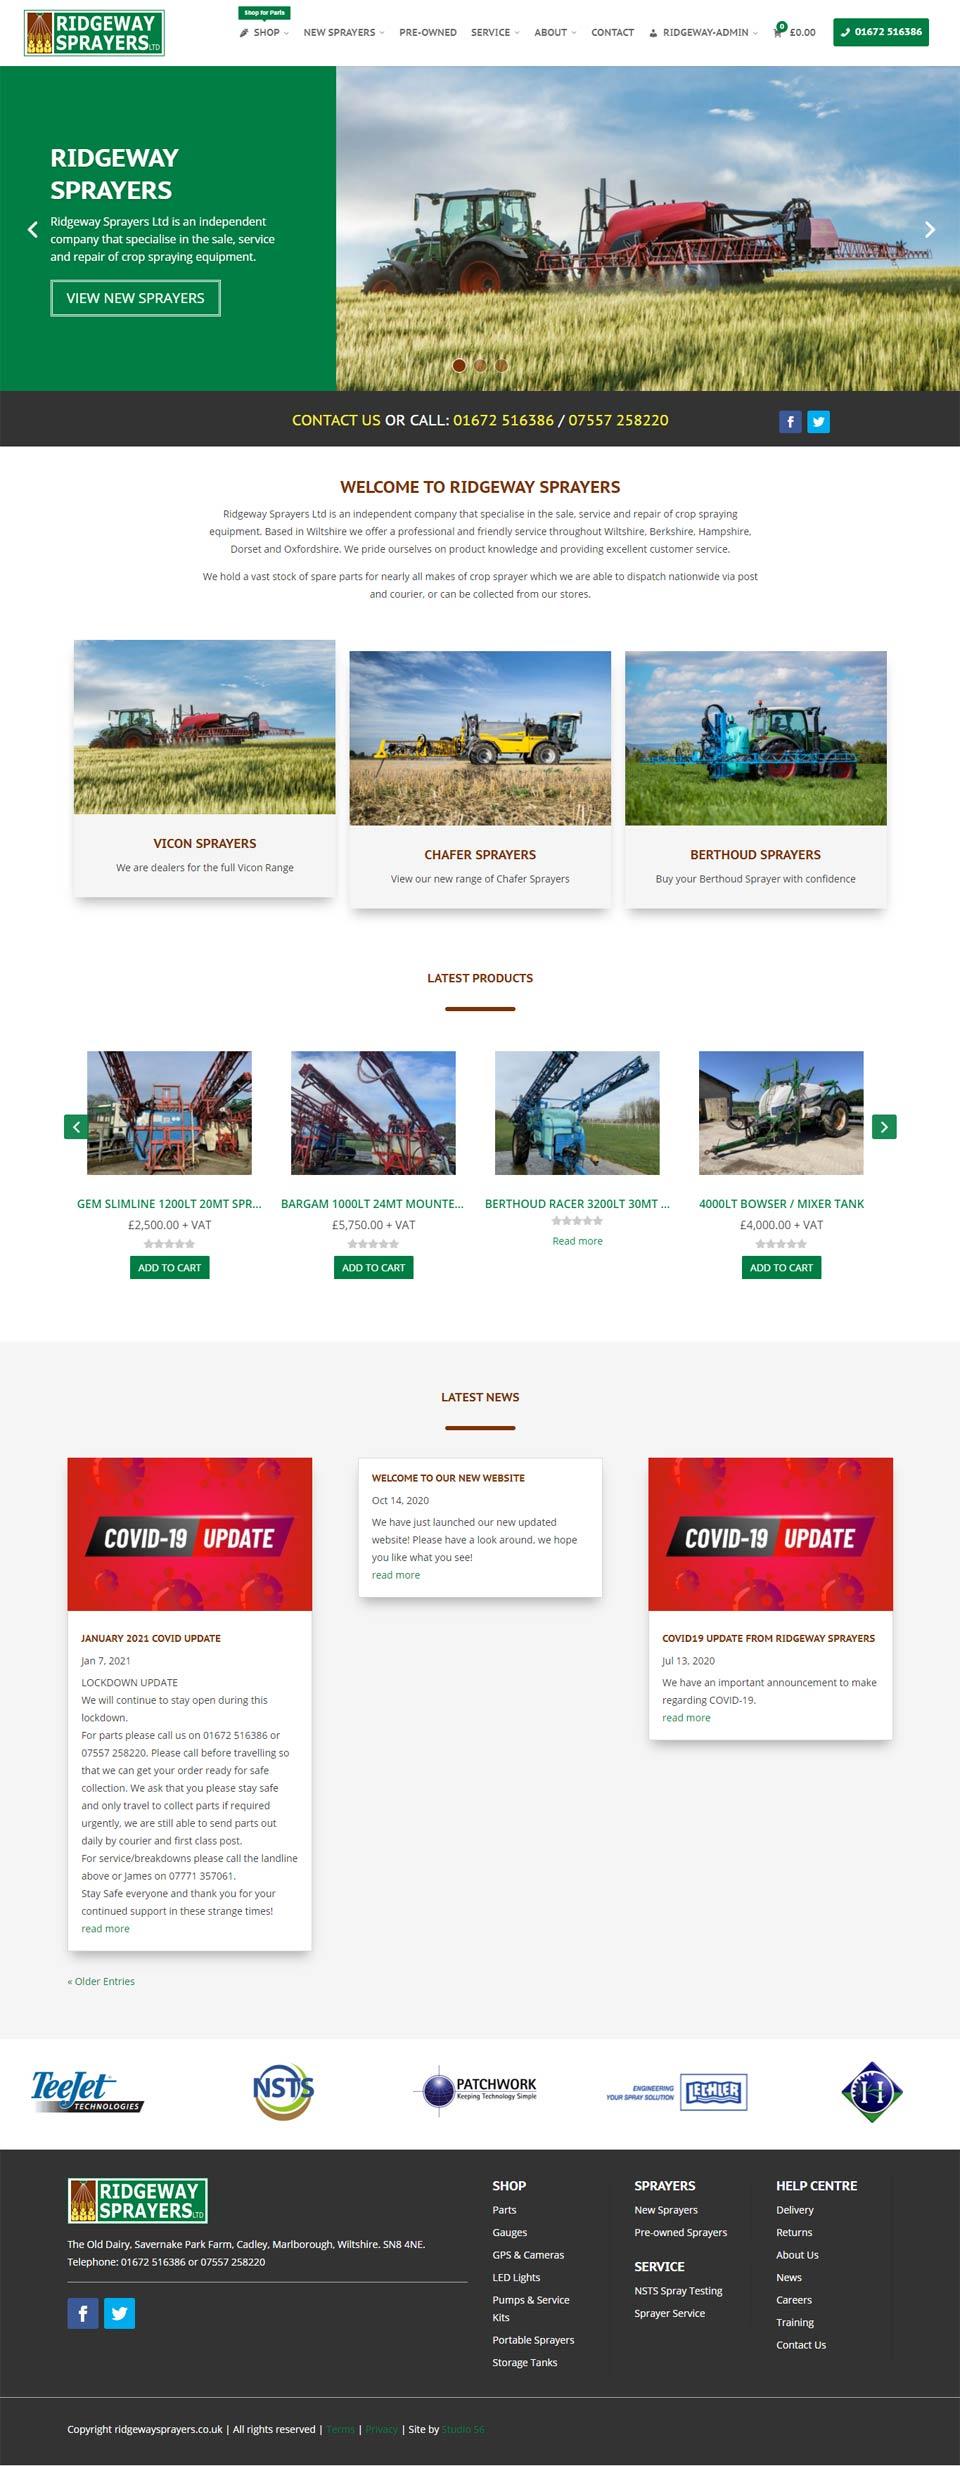 Ridgeway Sprayers new website designed and developed by Studio 56